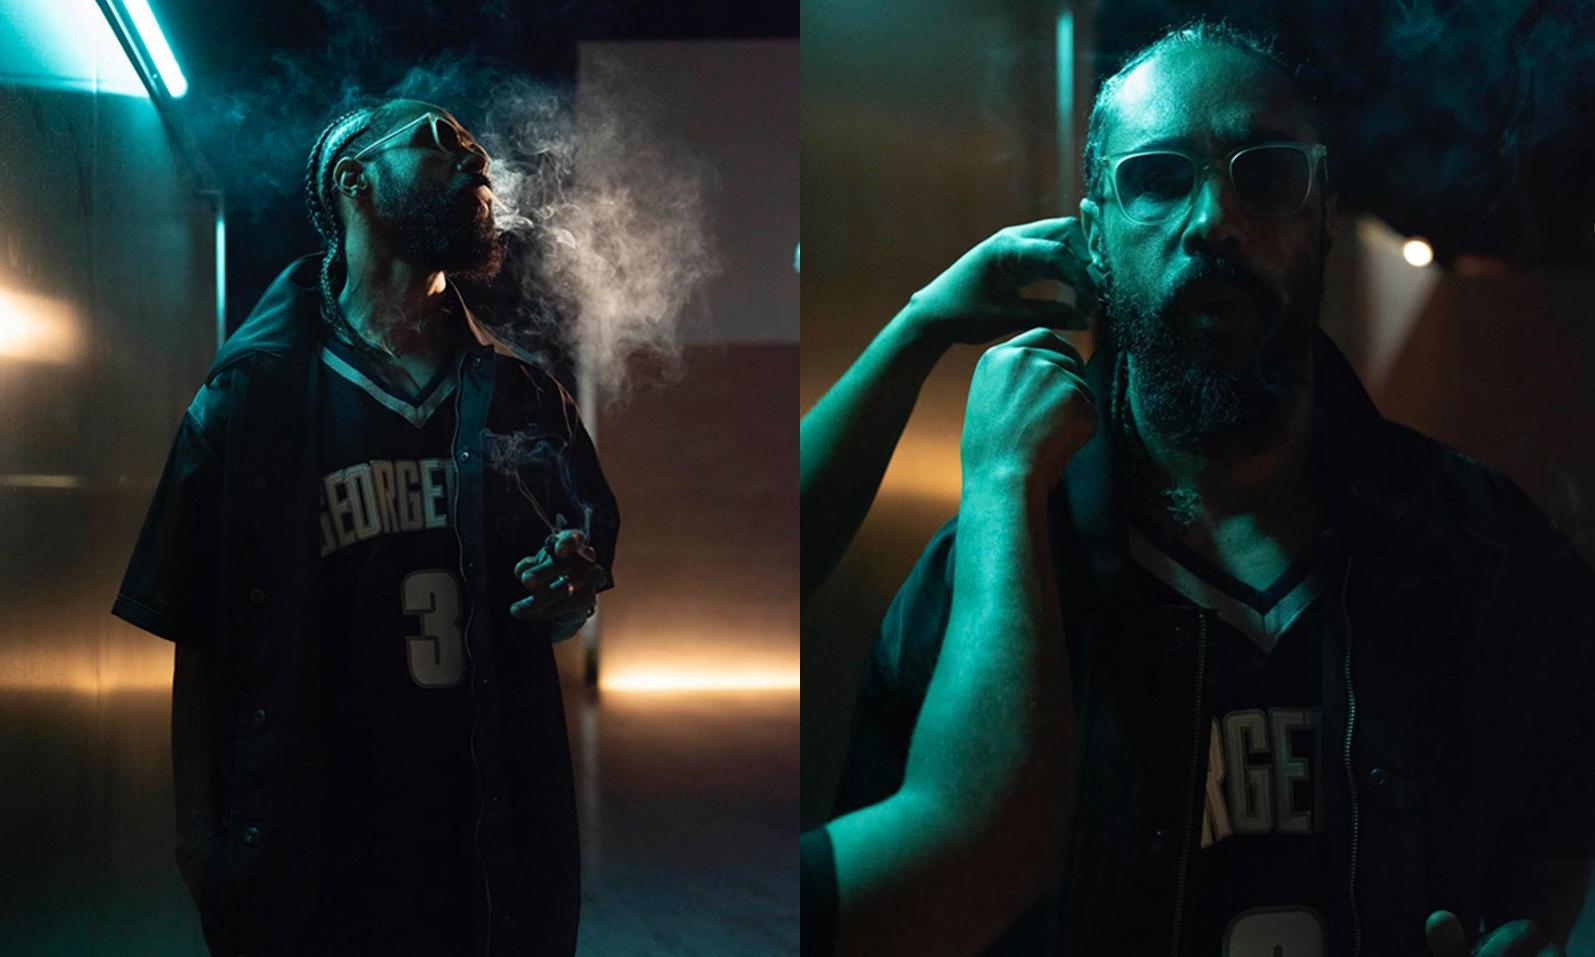 Jerry Lorenzo 亲晒 Fear Of God x Nike 2020 夏季合作系列